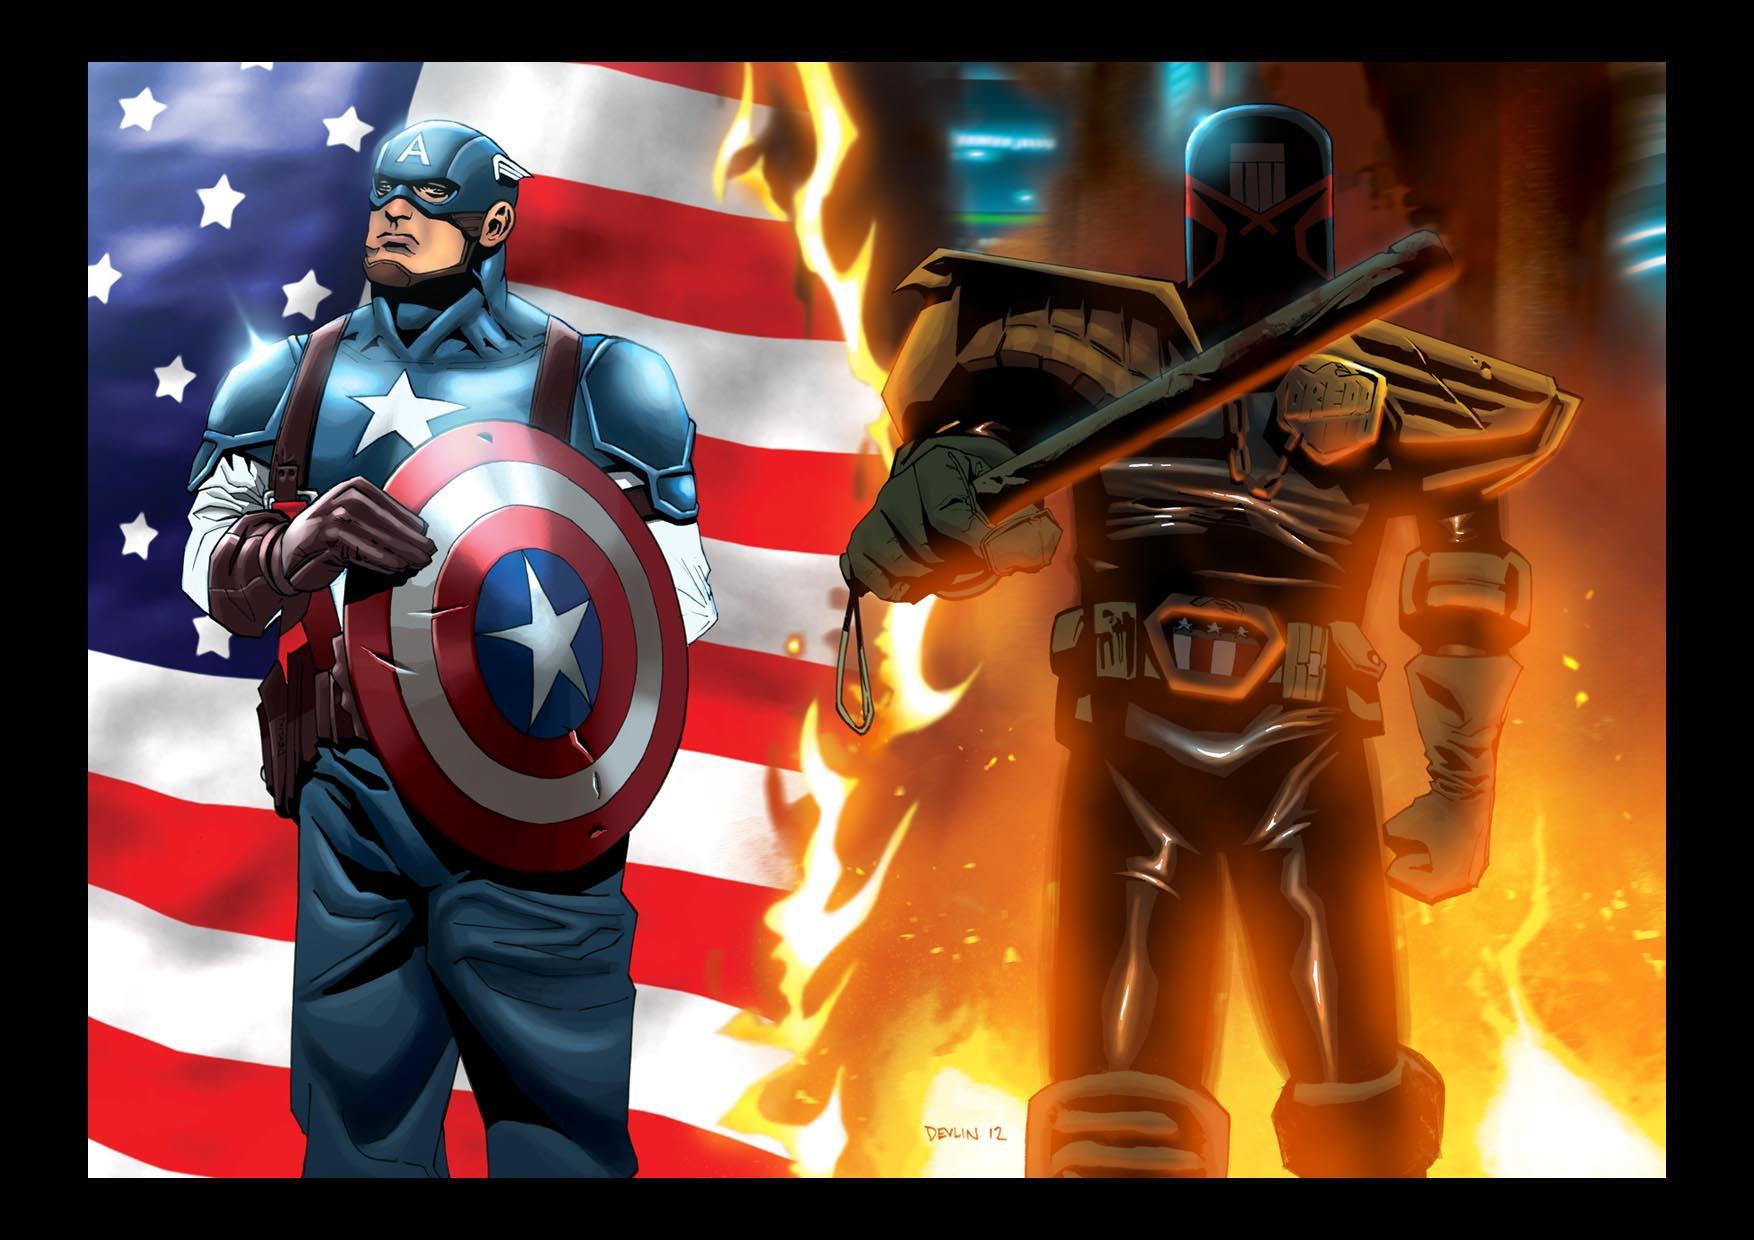 cap and dredd - american dream american nightmare